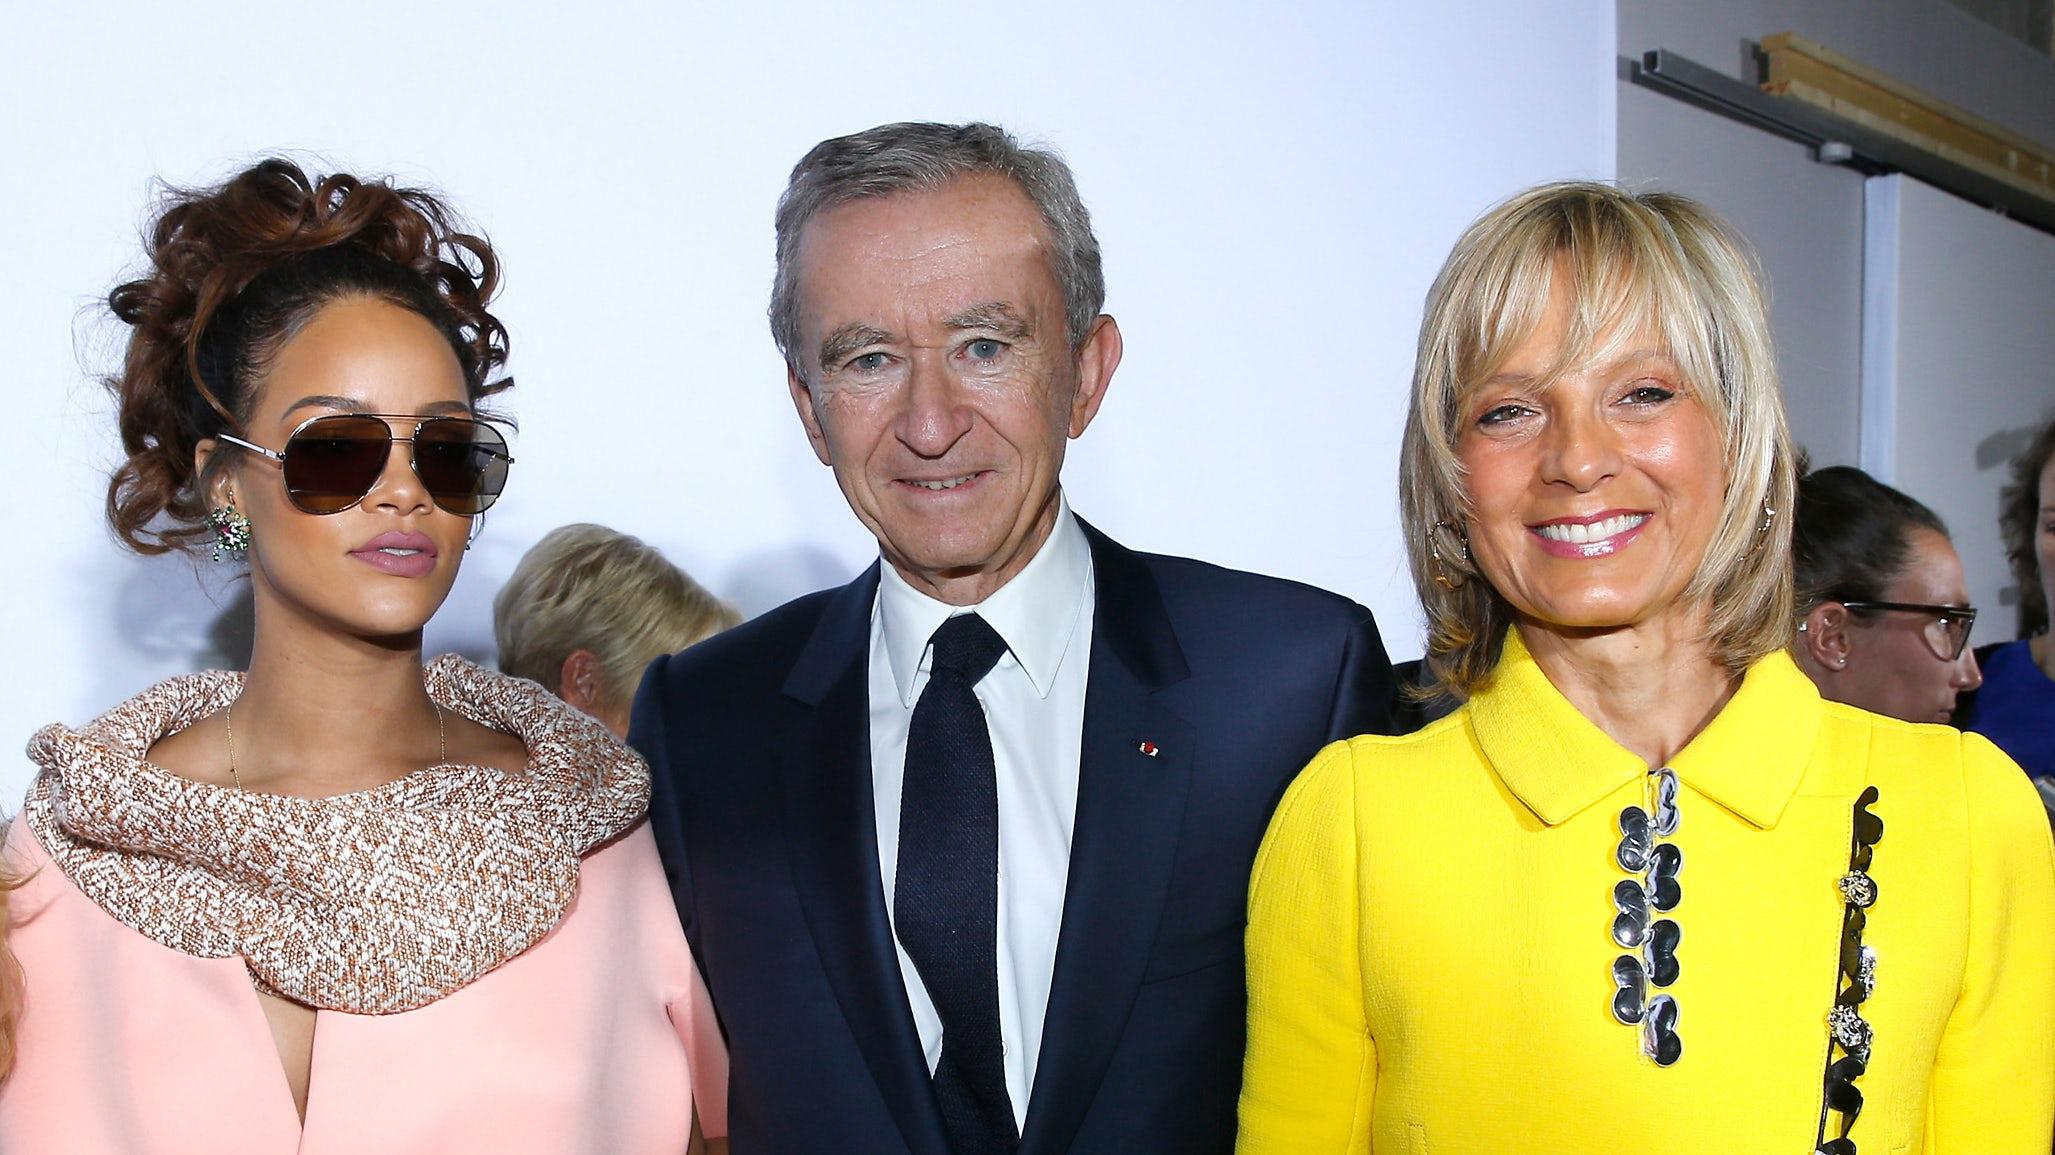 Rihanna, Bernard Arnault and Helene Arnault after Christian Dior show at Paris Fashion Week  Spring/Summer 2016 | Source: Getty